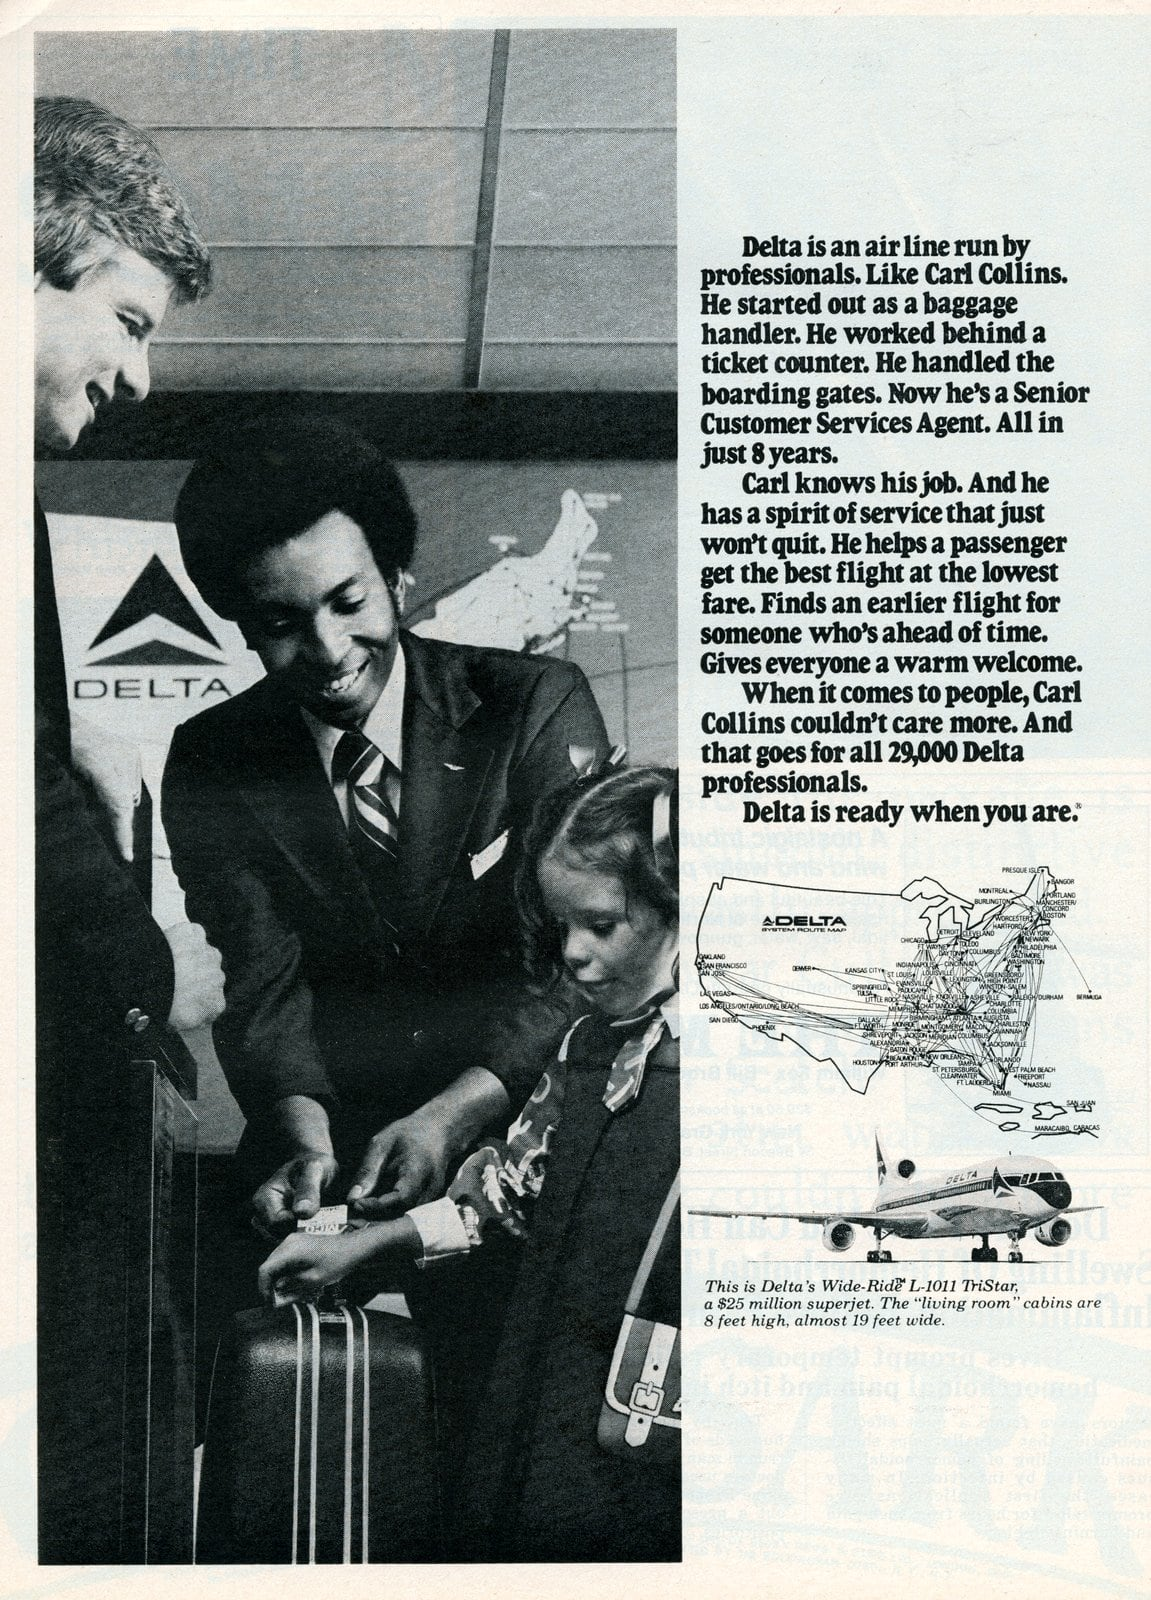 Delta air Senior Customer Service agent Carl Collins (1977)